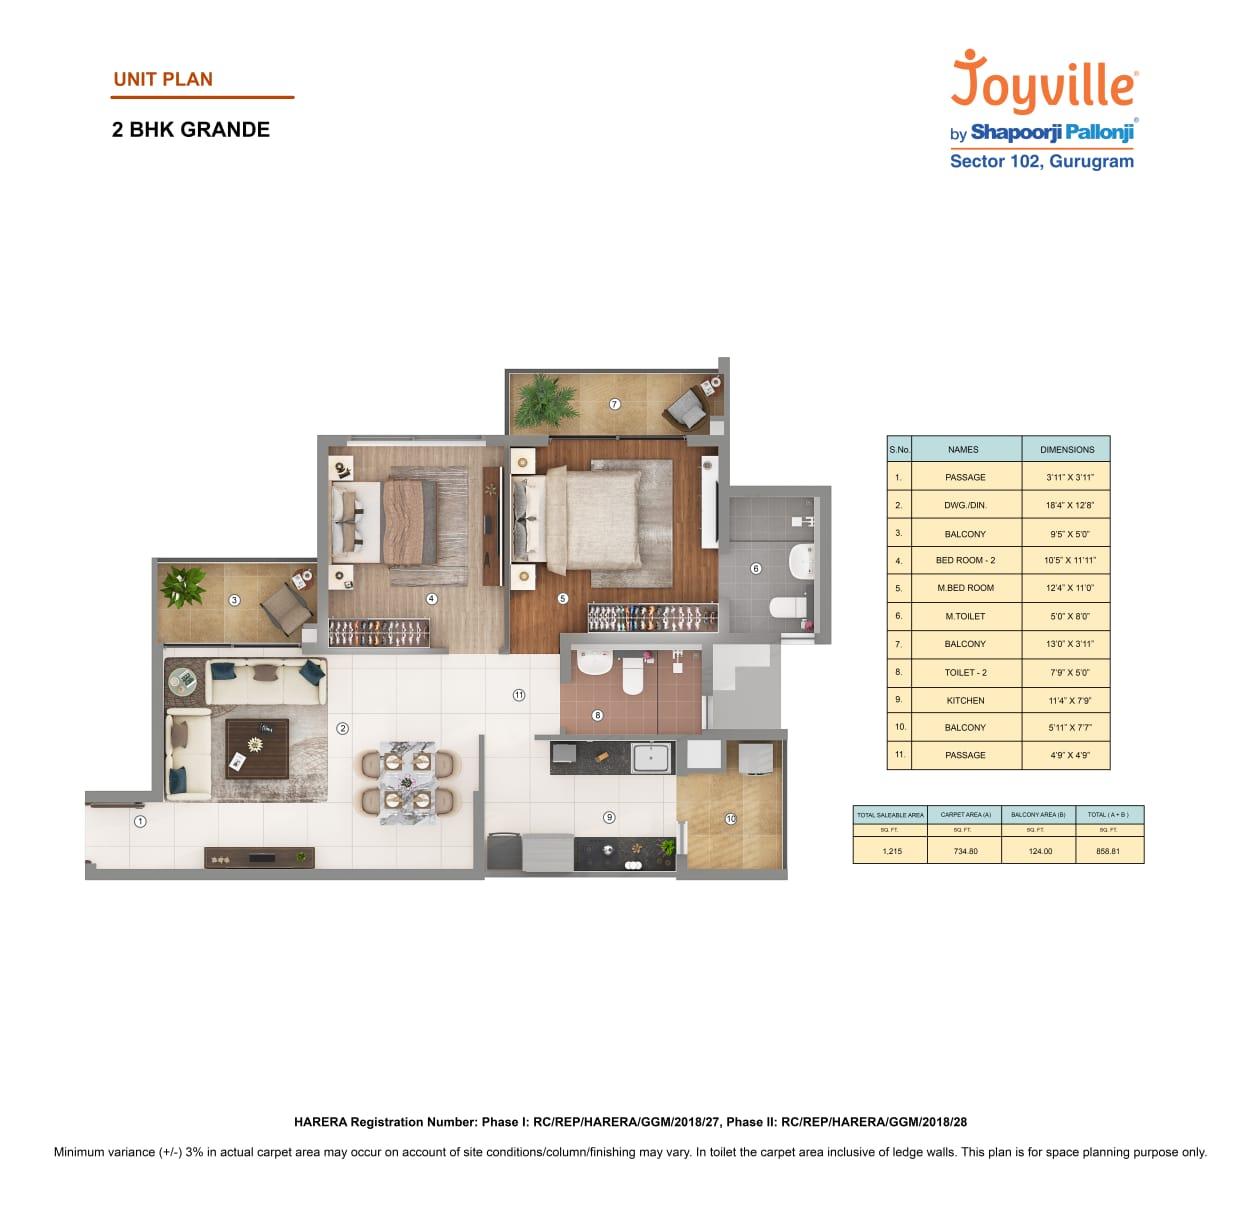 Joyville 2BHK Grande Area-1215